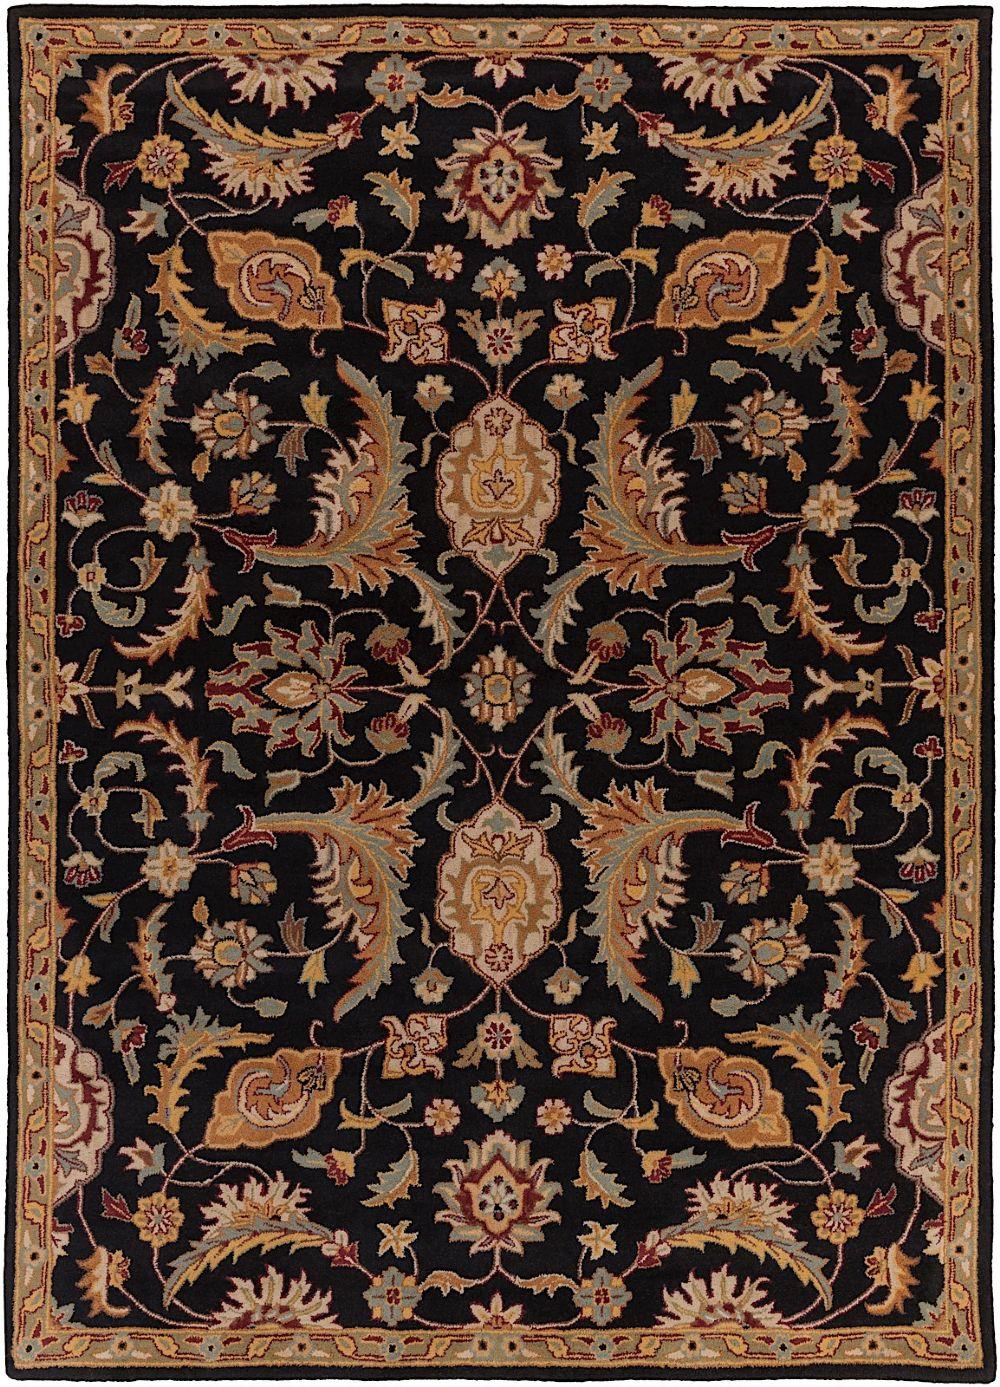 surya middleton traditional area rug collection